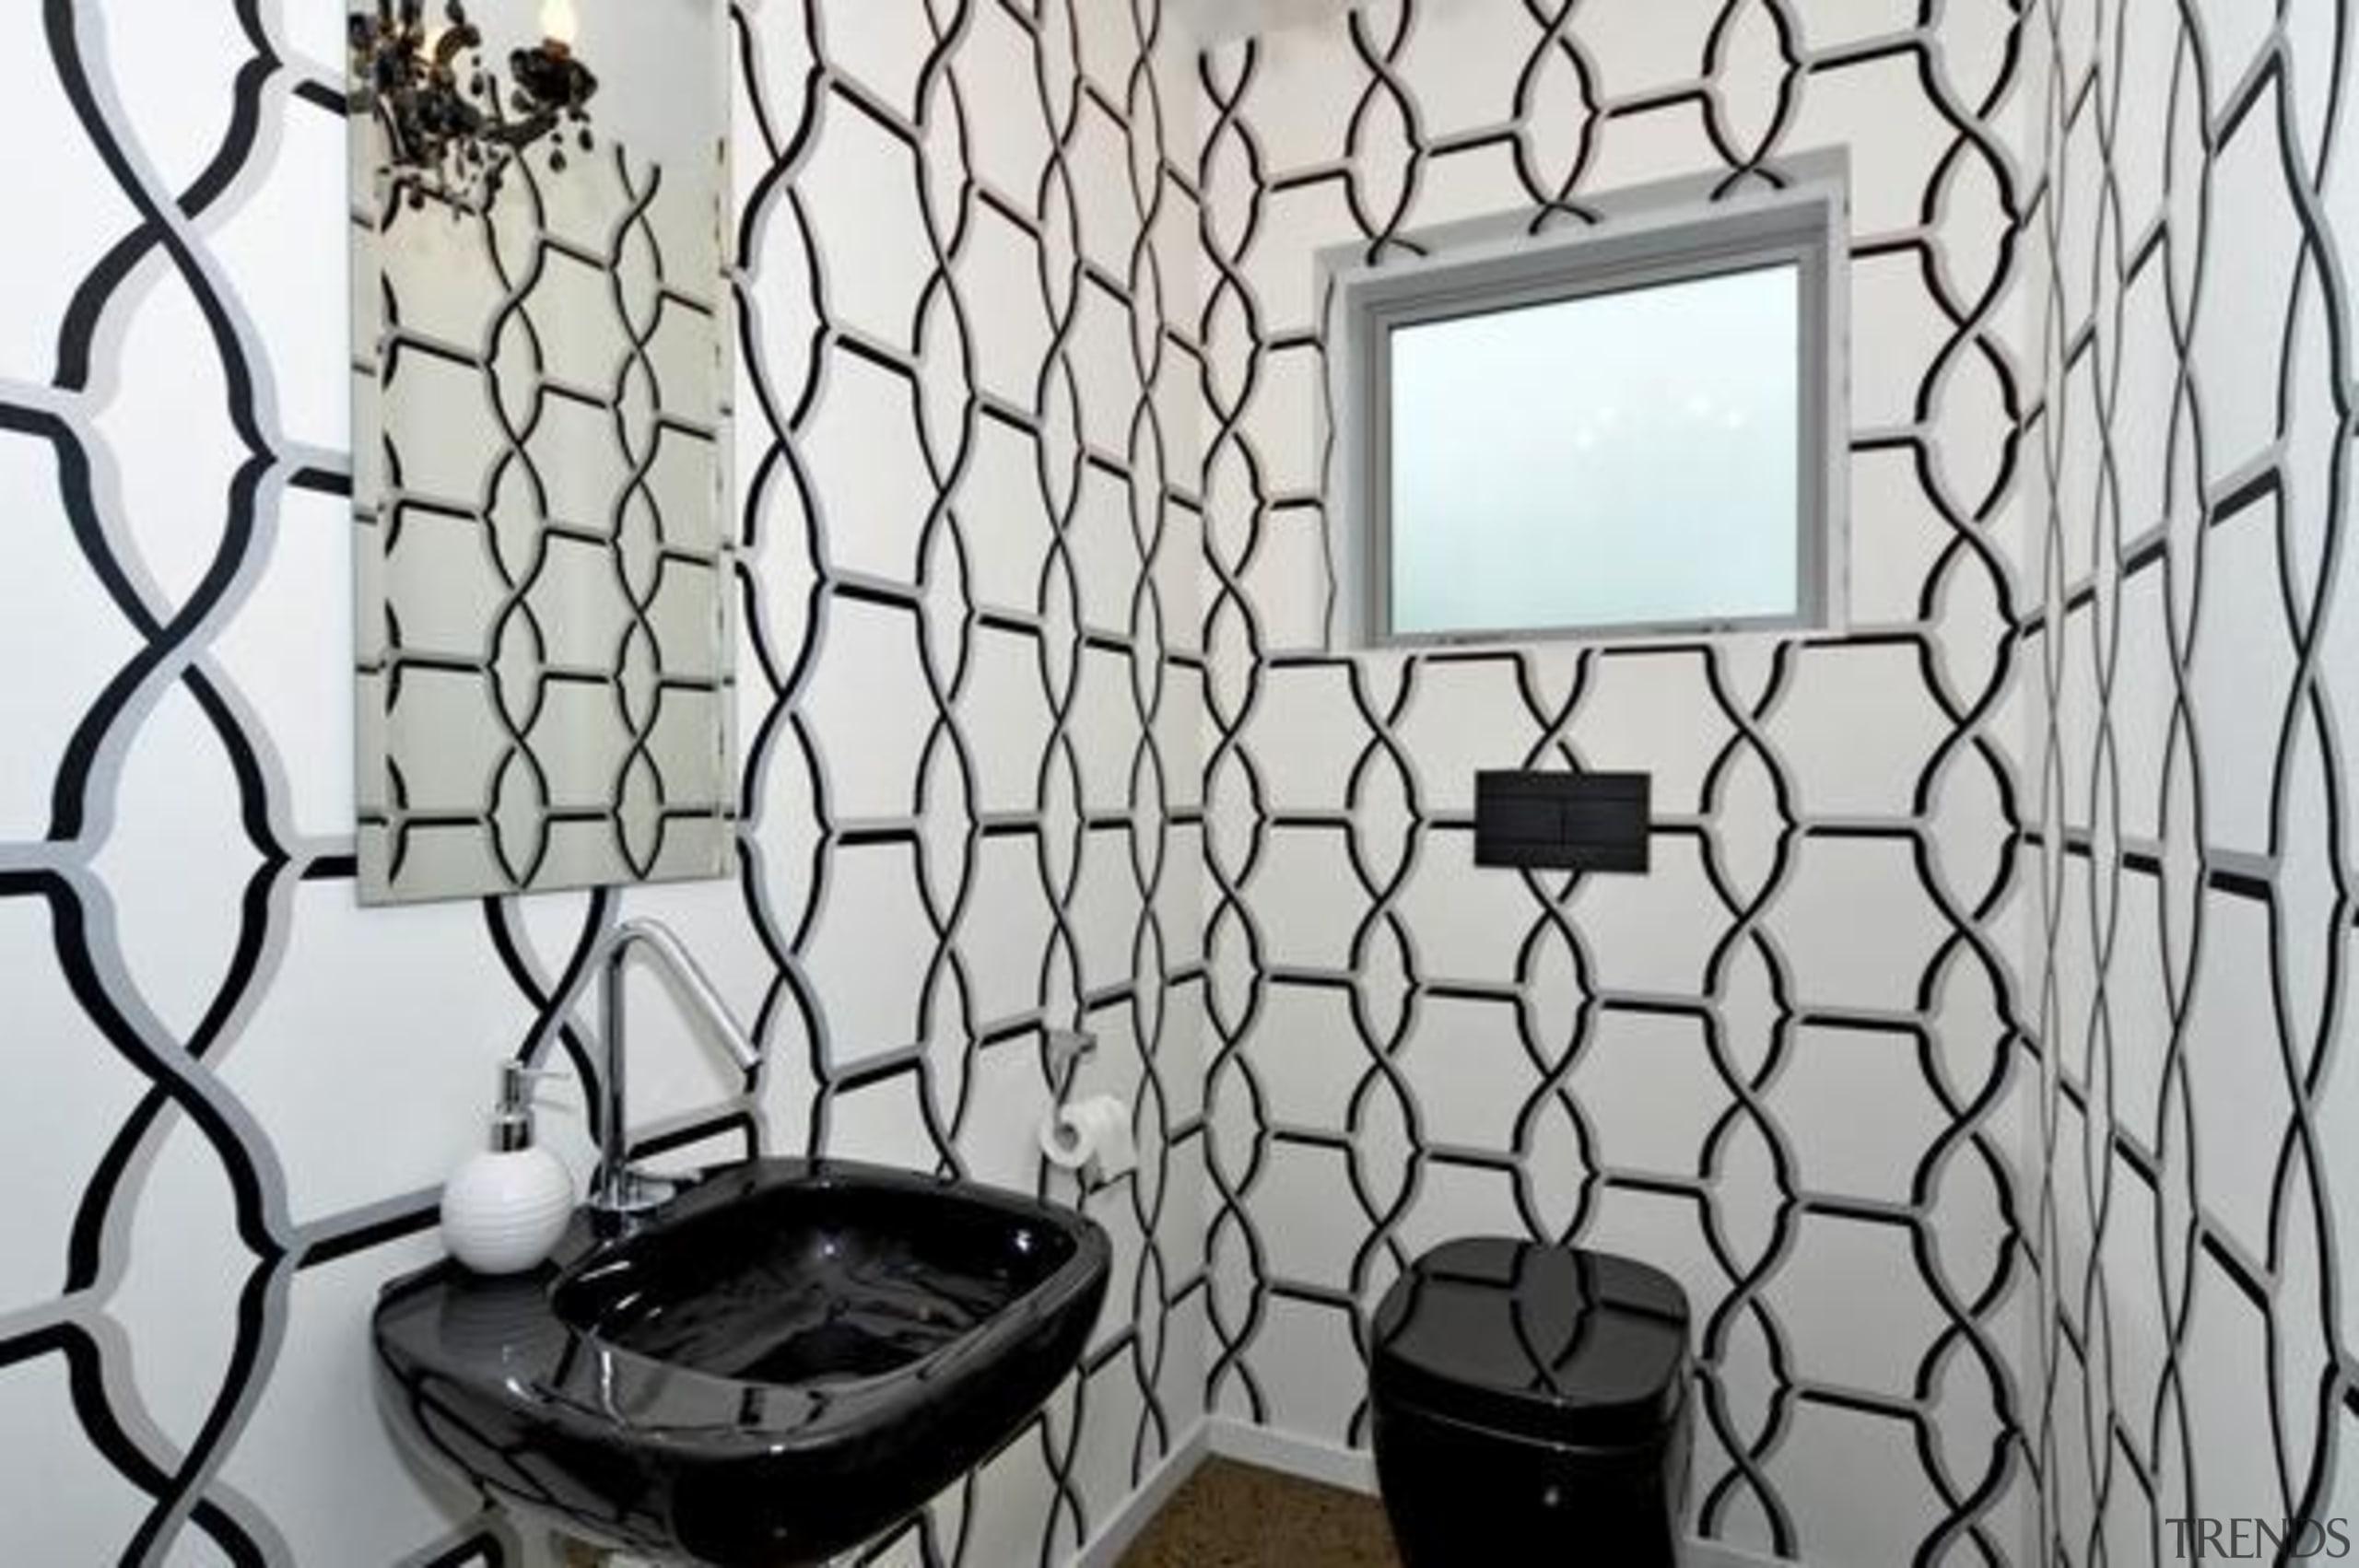 Daring Approach - design | glass | interior design, glass, interior design, pattern, room, tile, wall, window, gray, white